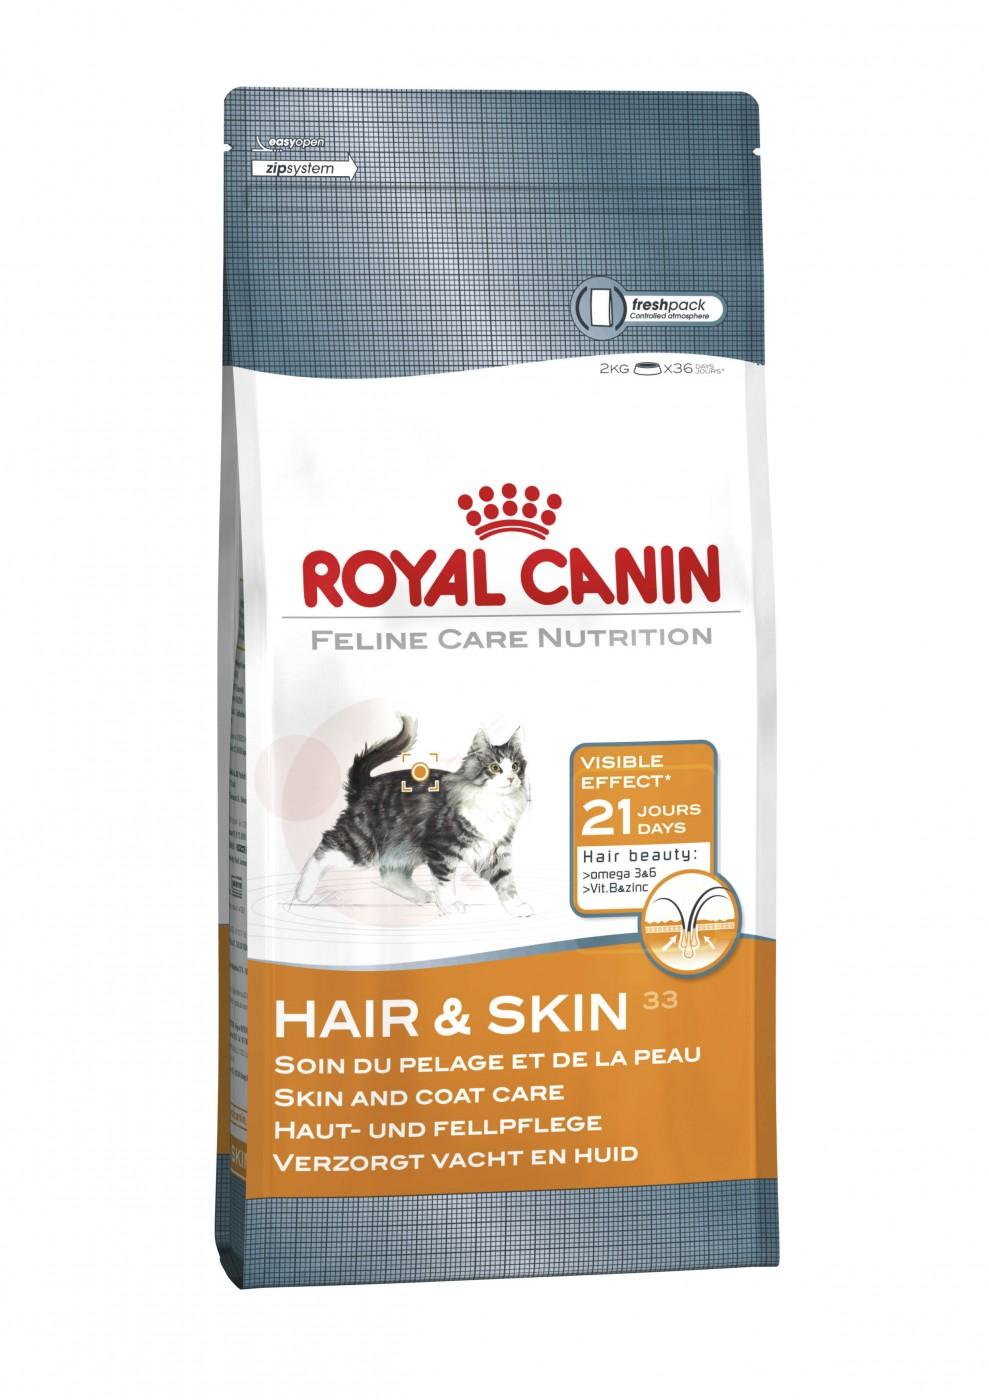 Royal Canin Hair und Skin 33 | 400g Katzenfutter trocken